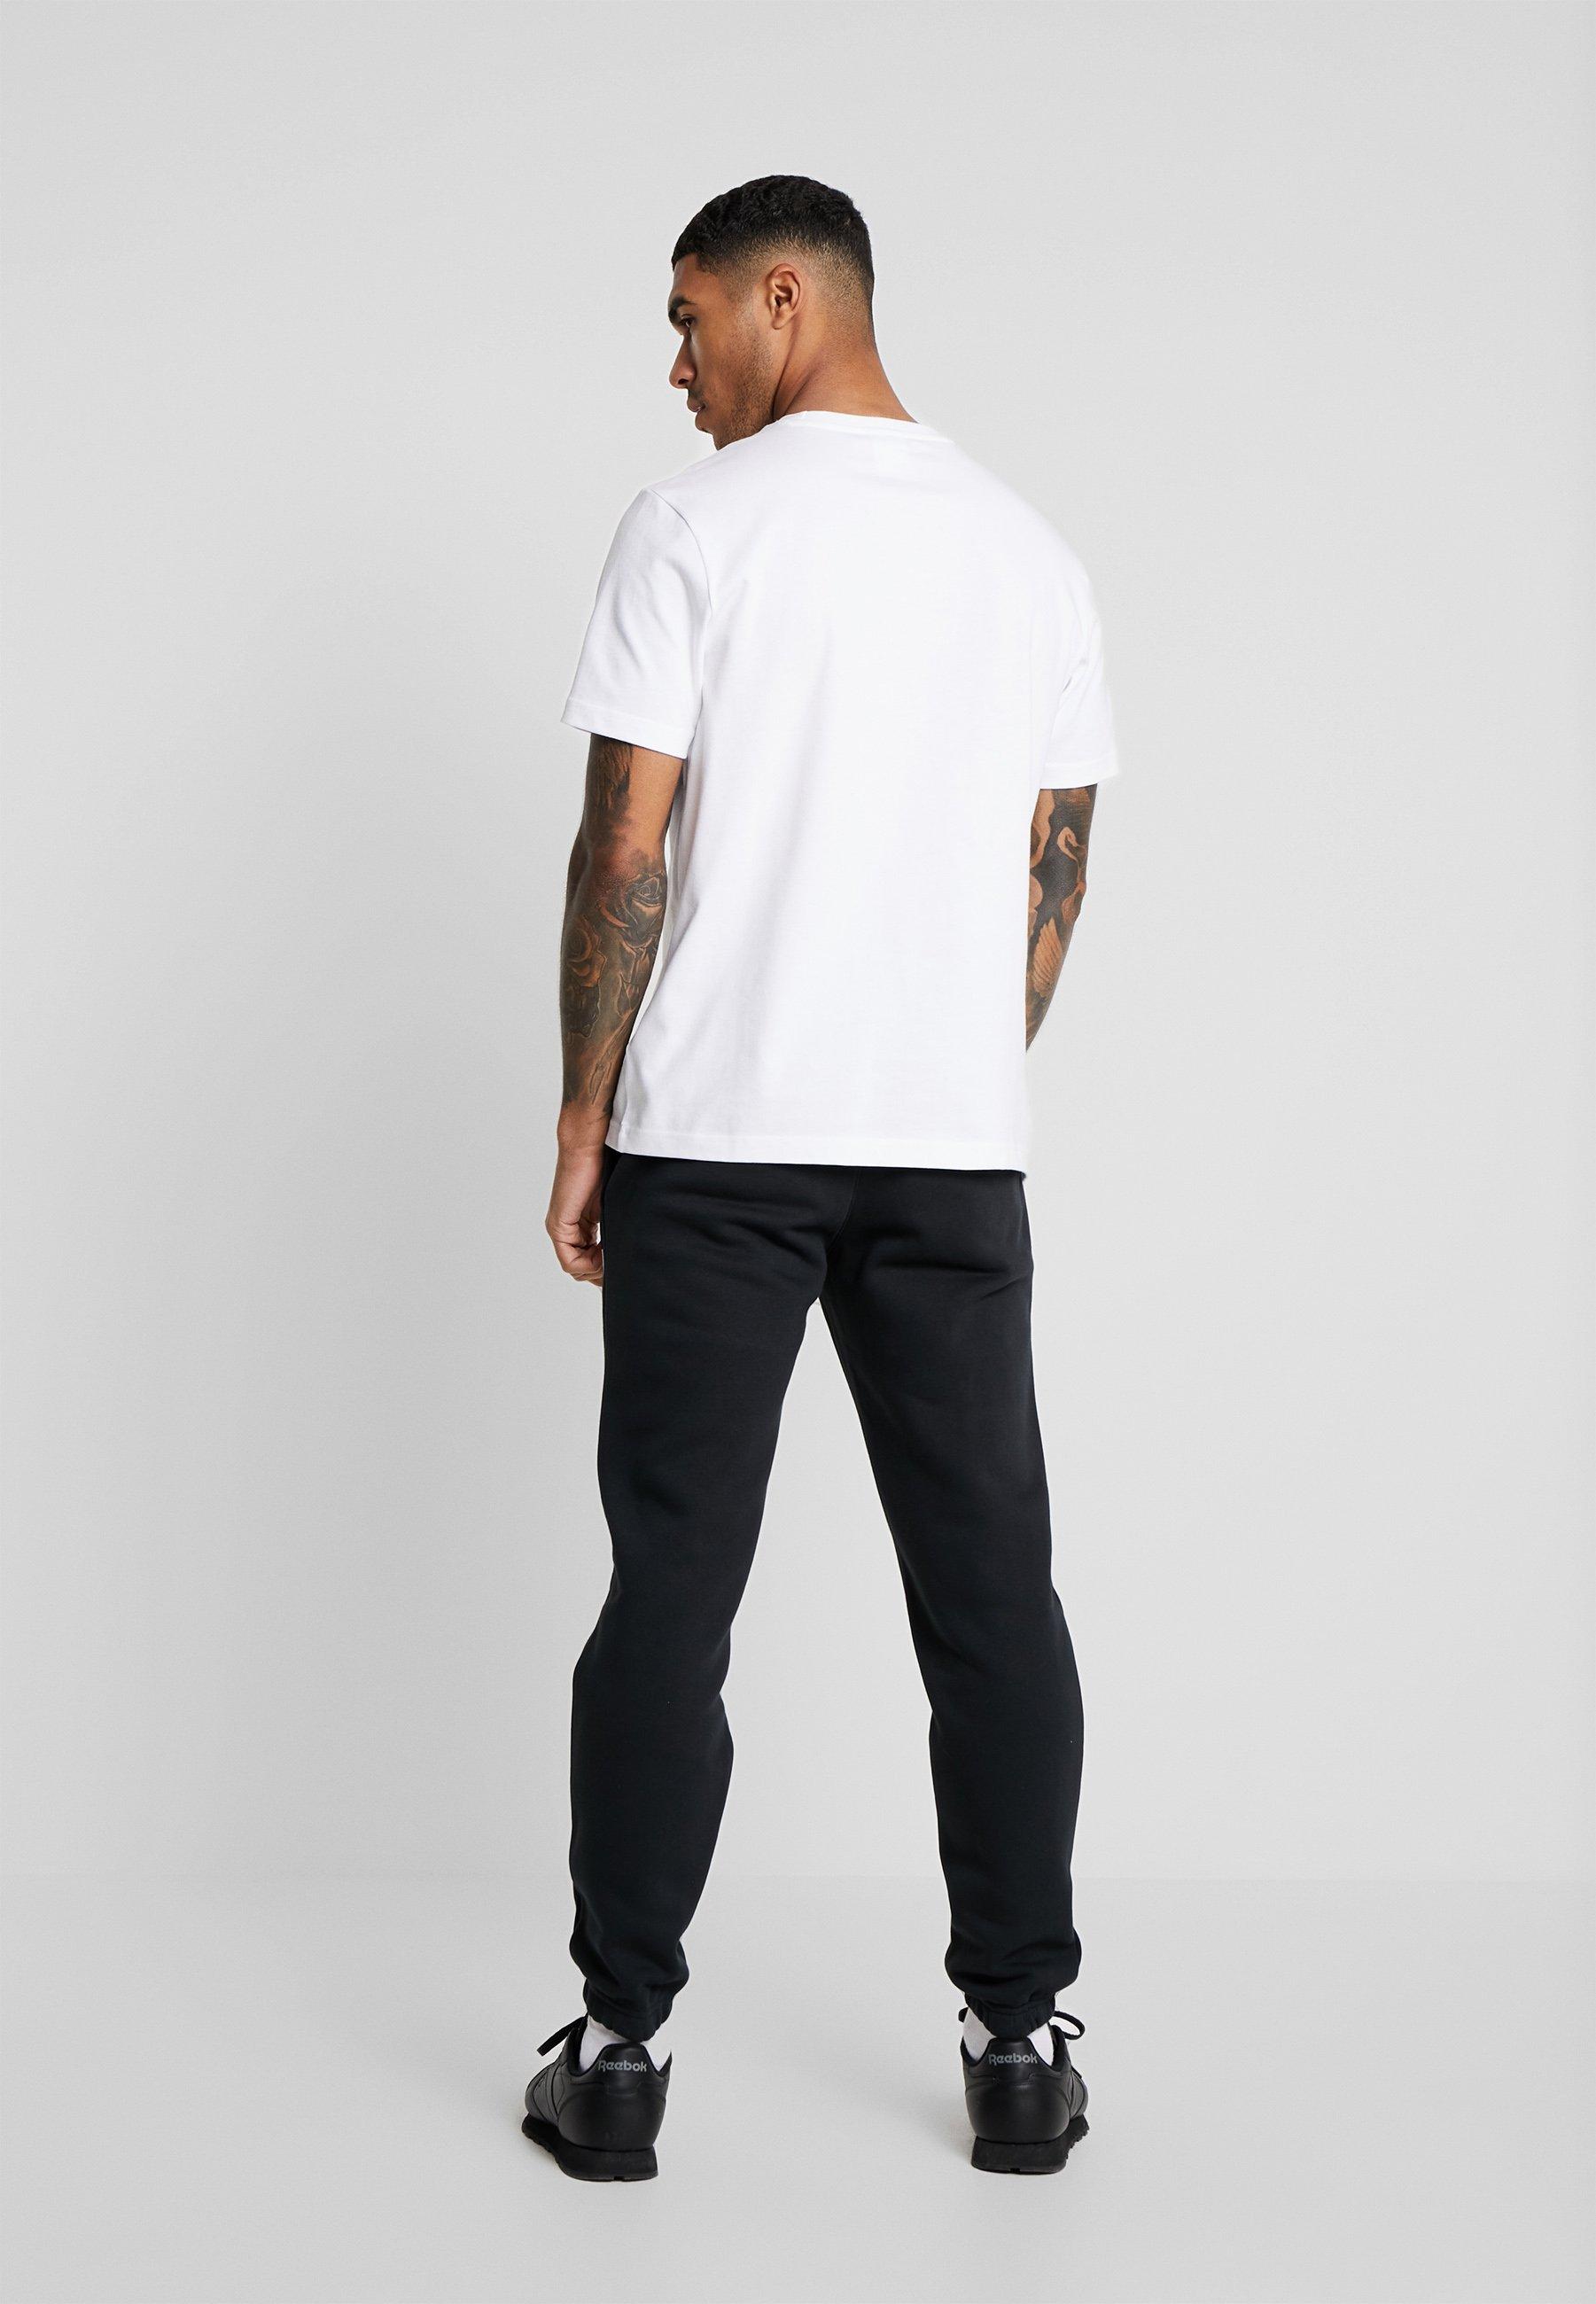 Classic black Reebok TeeT White shirt Imprimé erdCoxB